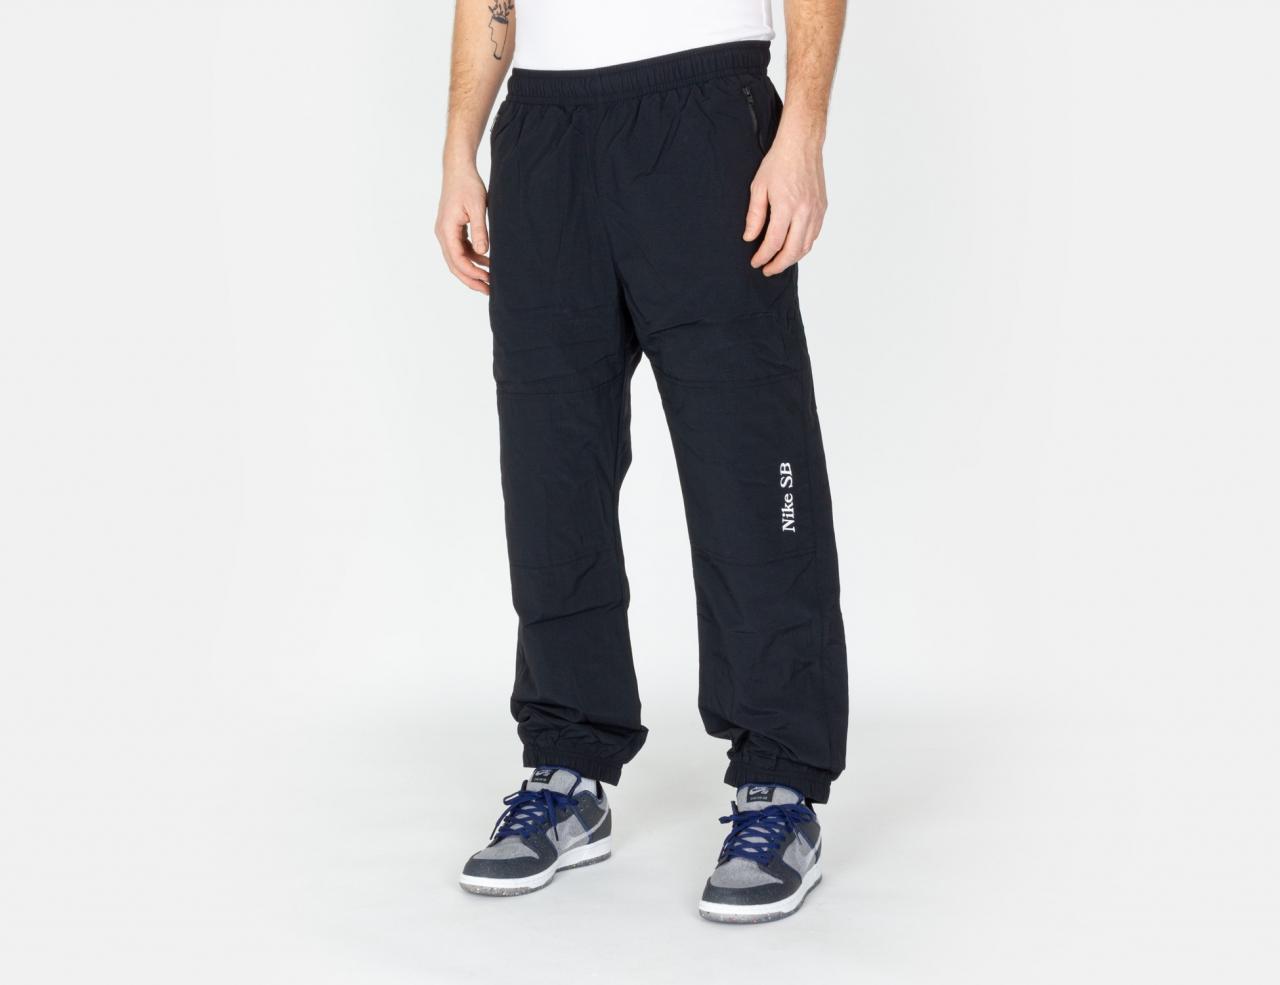 Nike SB Skate Track Hose - Black / White